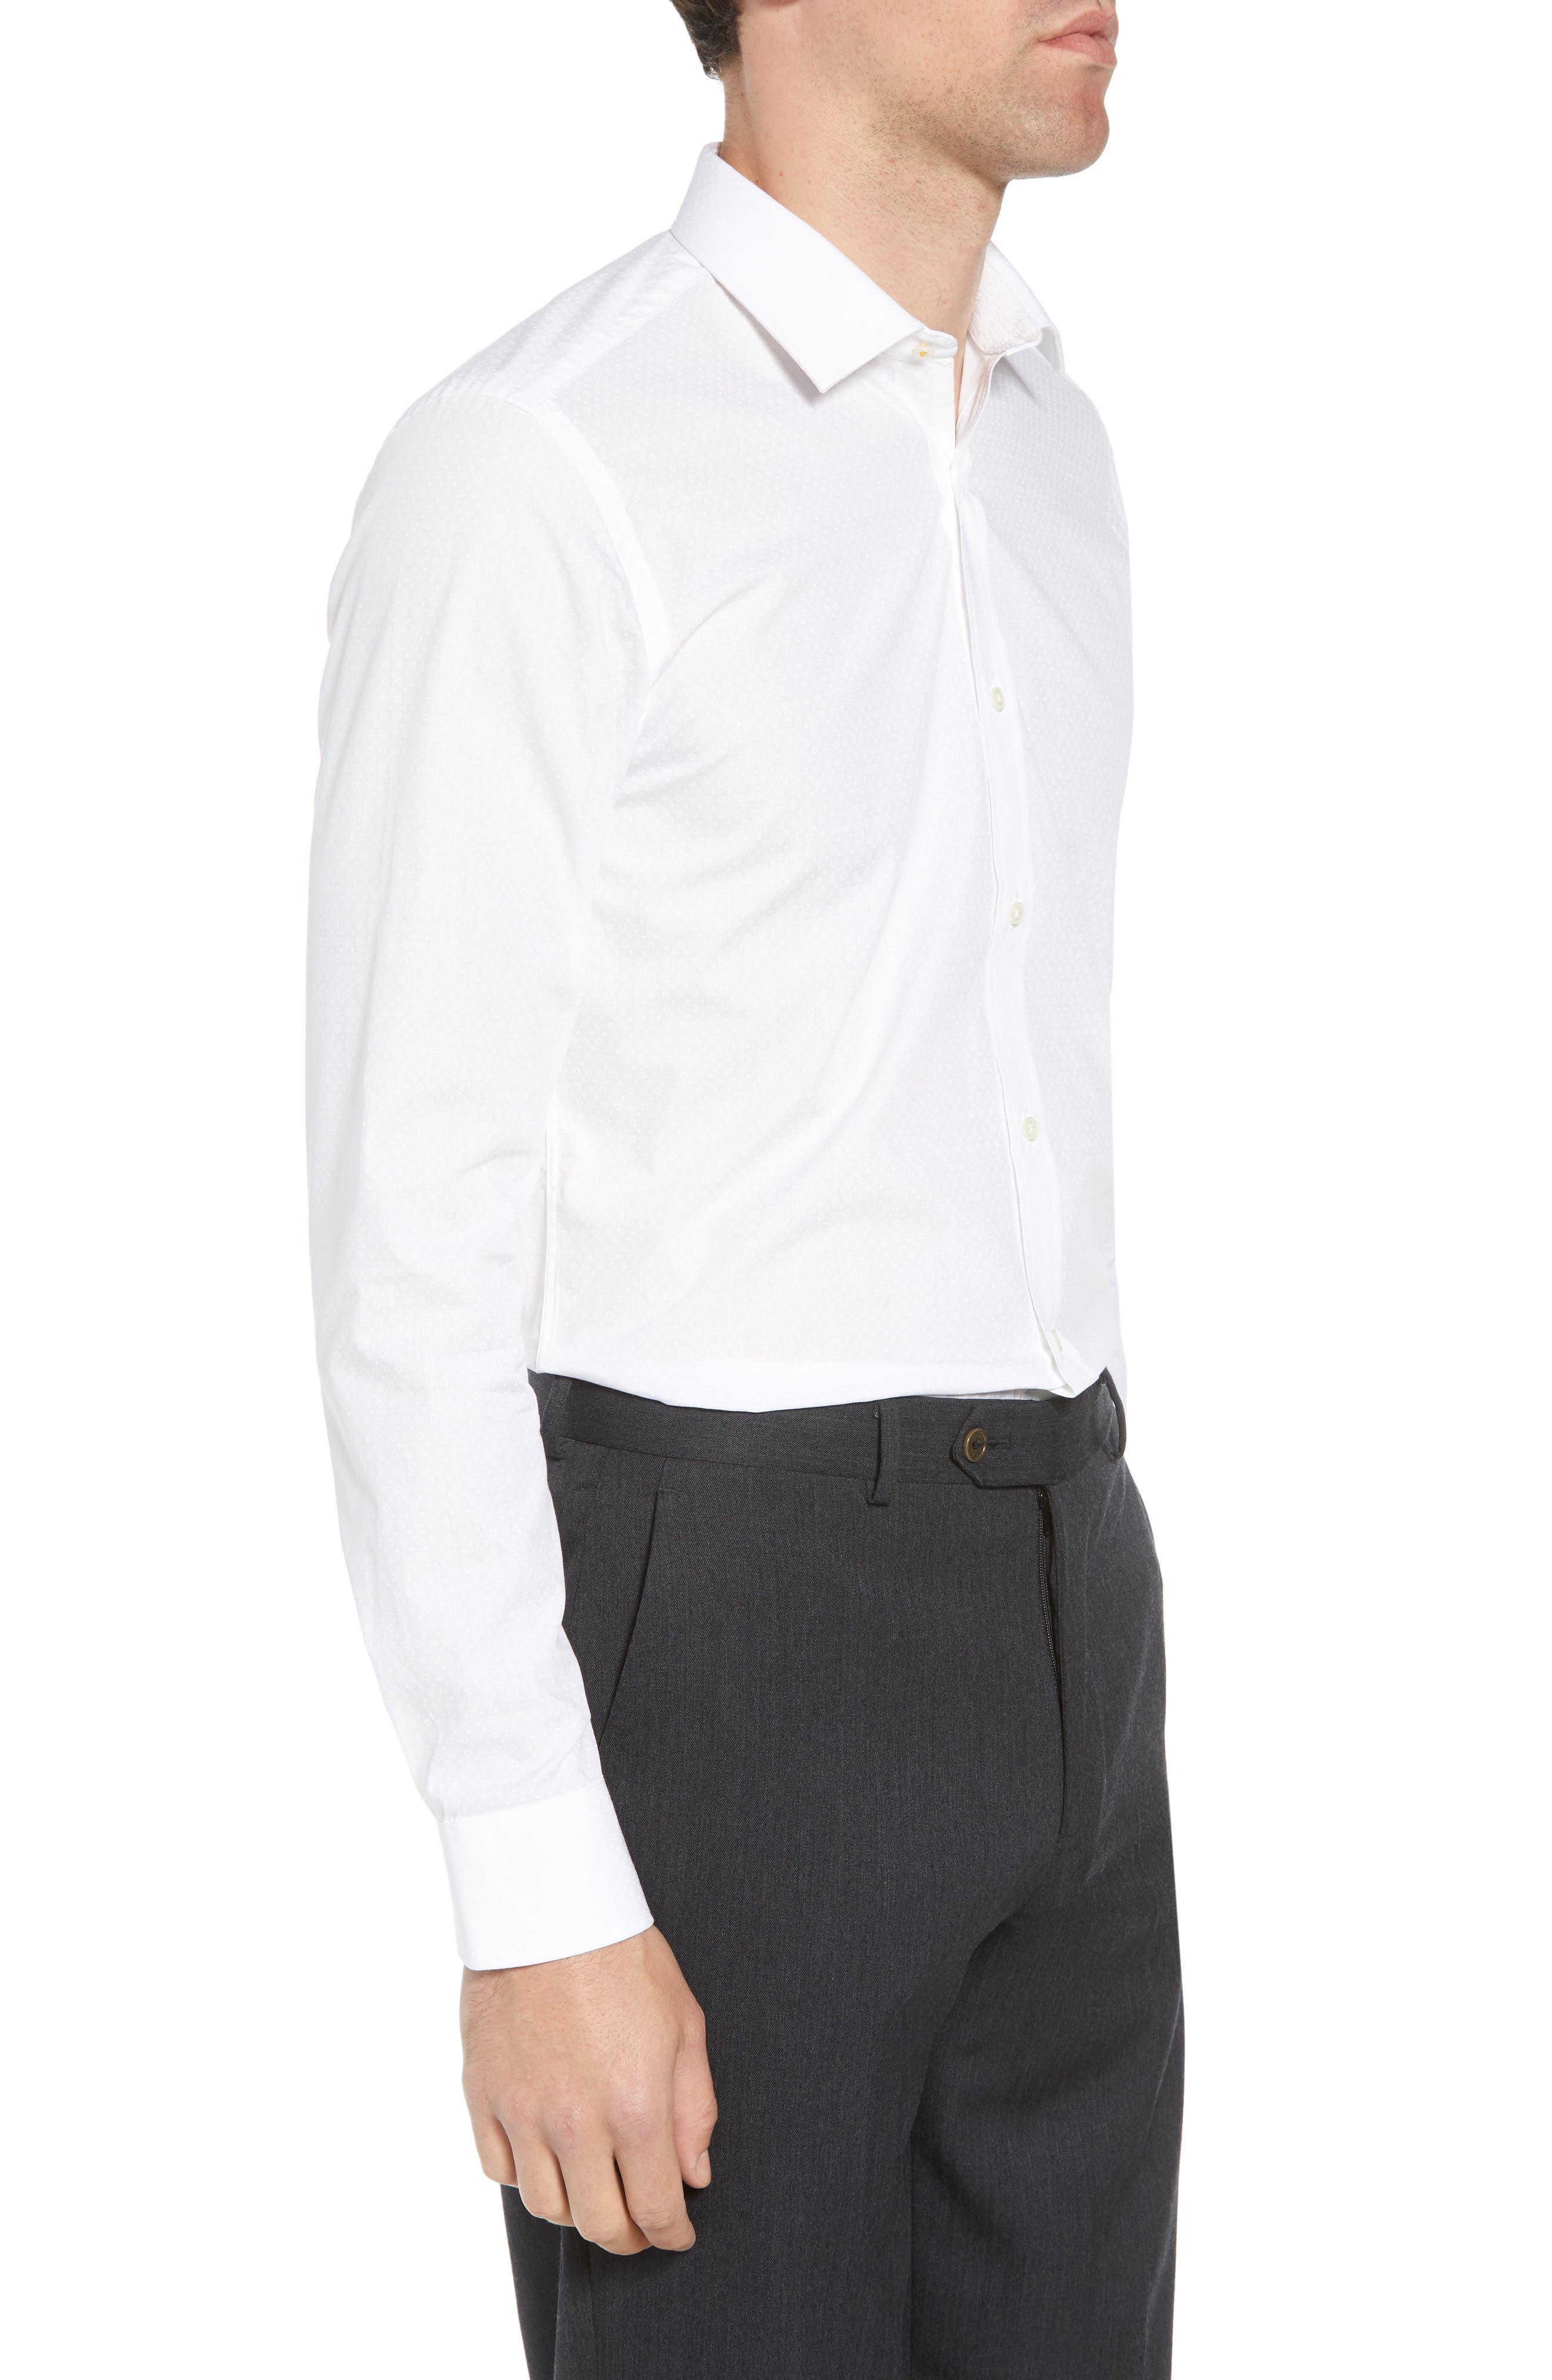 Loops Slim Fit Dress Shirt,                             Alternate thumbnail 4, color,                             110